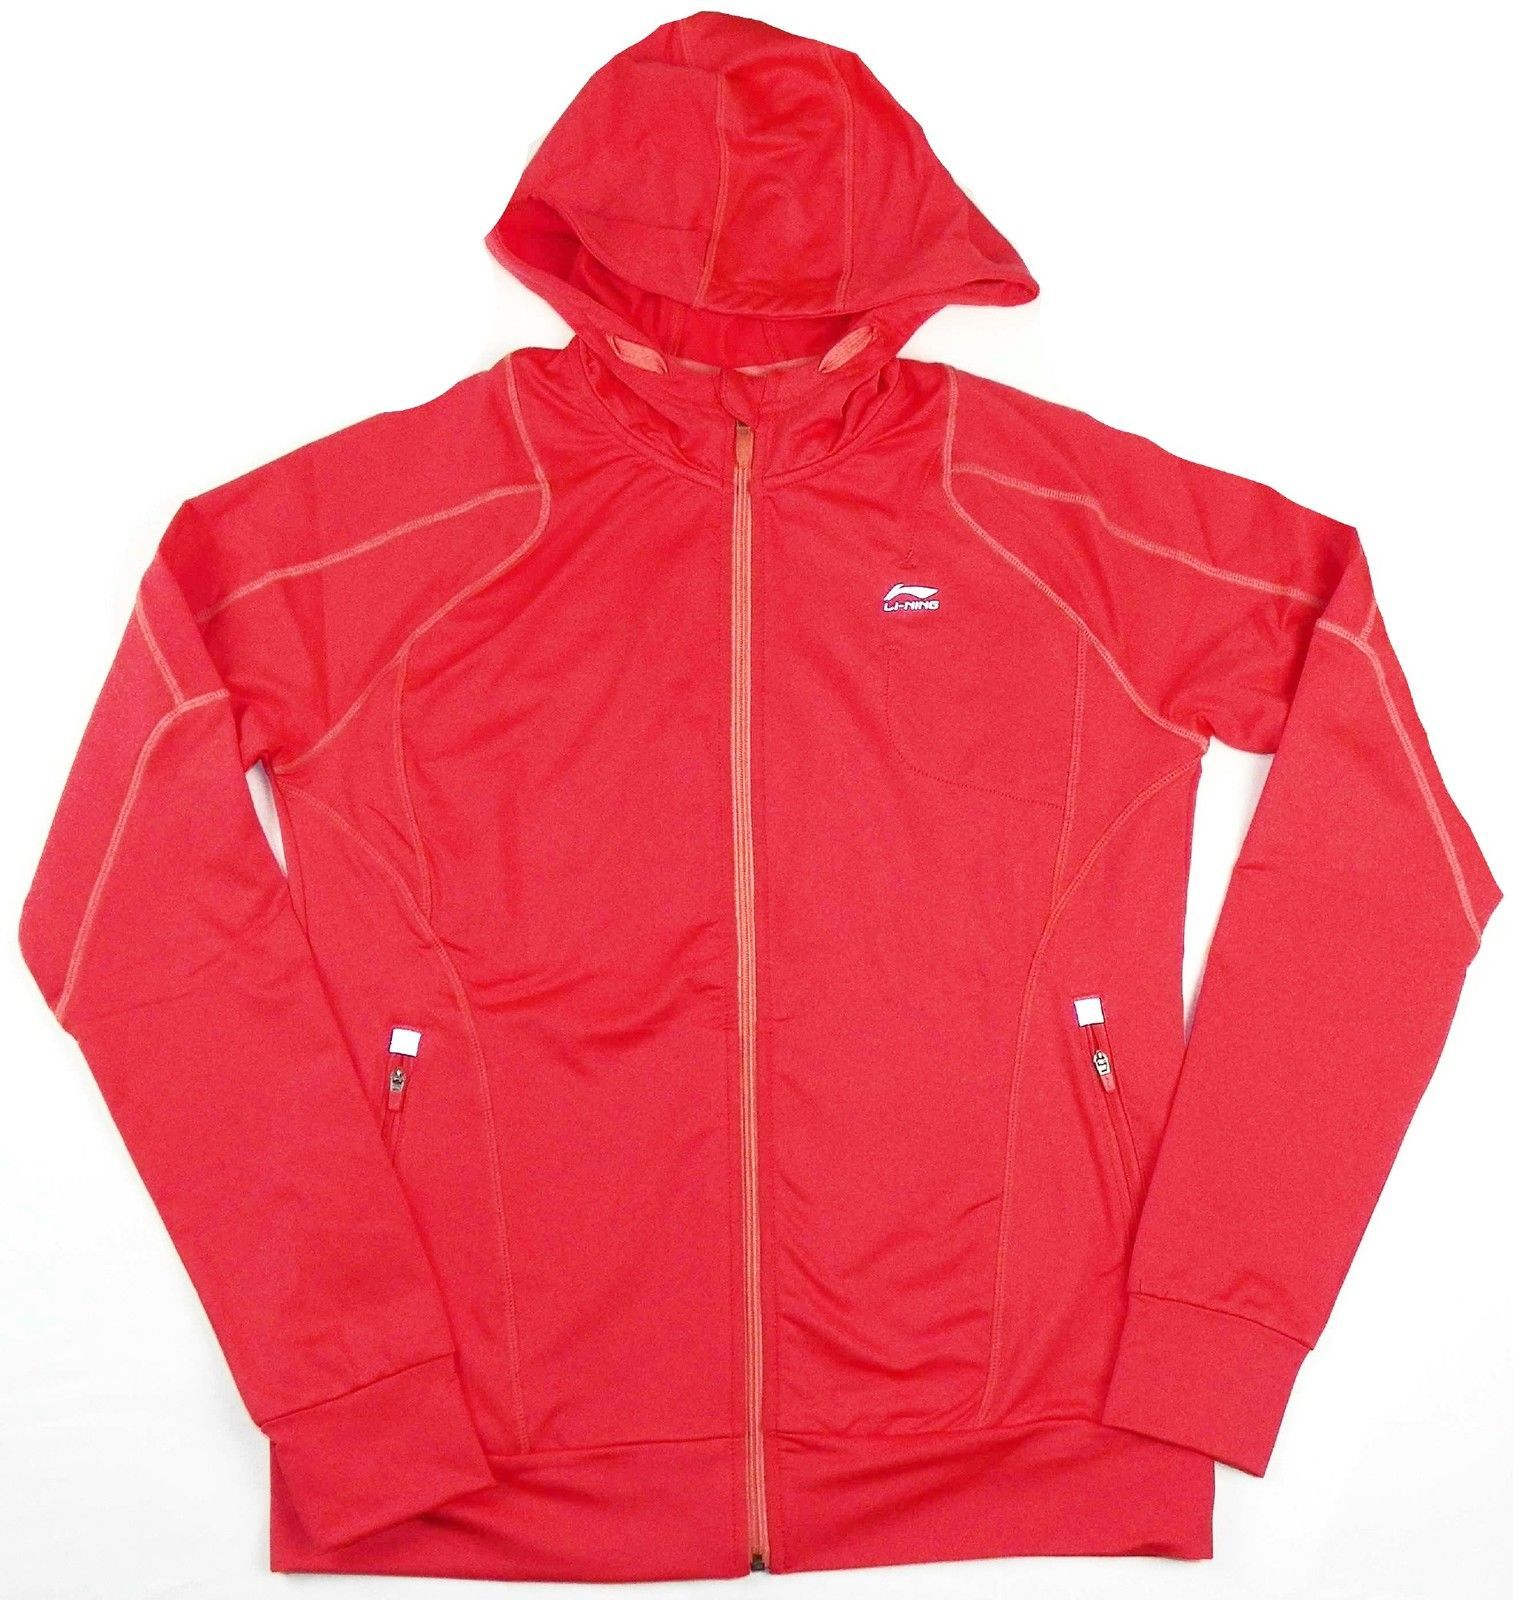 Women's Large Jacket Li-Ning Full Zip Athletic Fitness Yoga Running NEW Coral